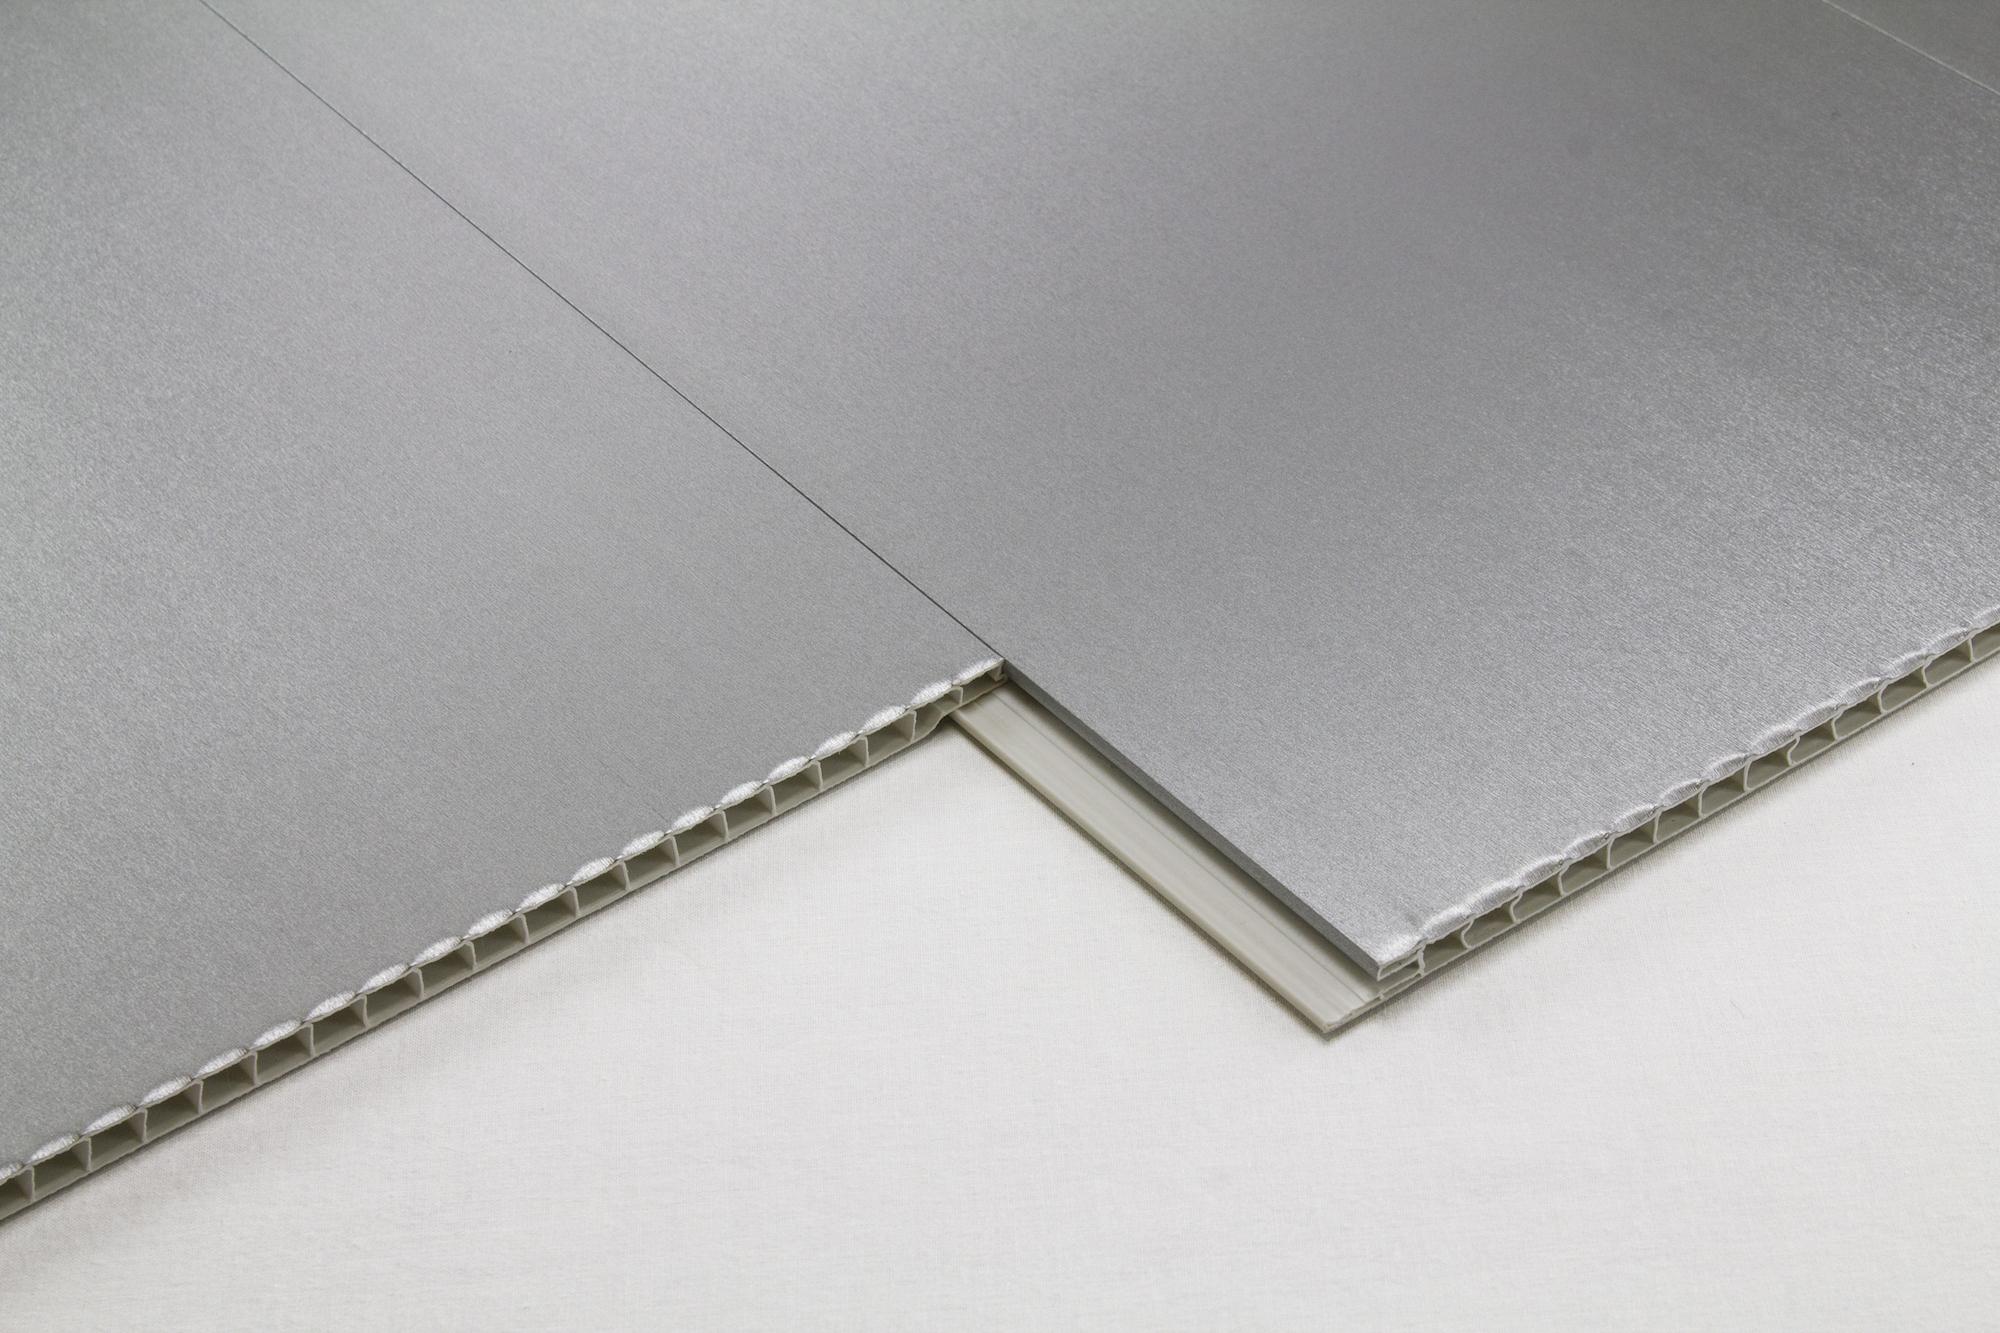 1 m2 pvc paneele platten wasserfest innen decke wand. Black Bedroom Furniture Sets. Home Design Ideas